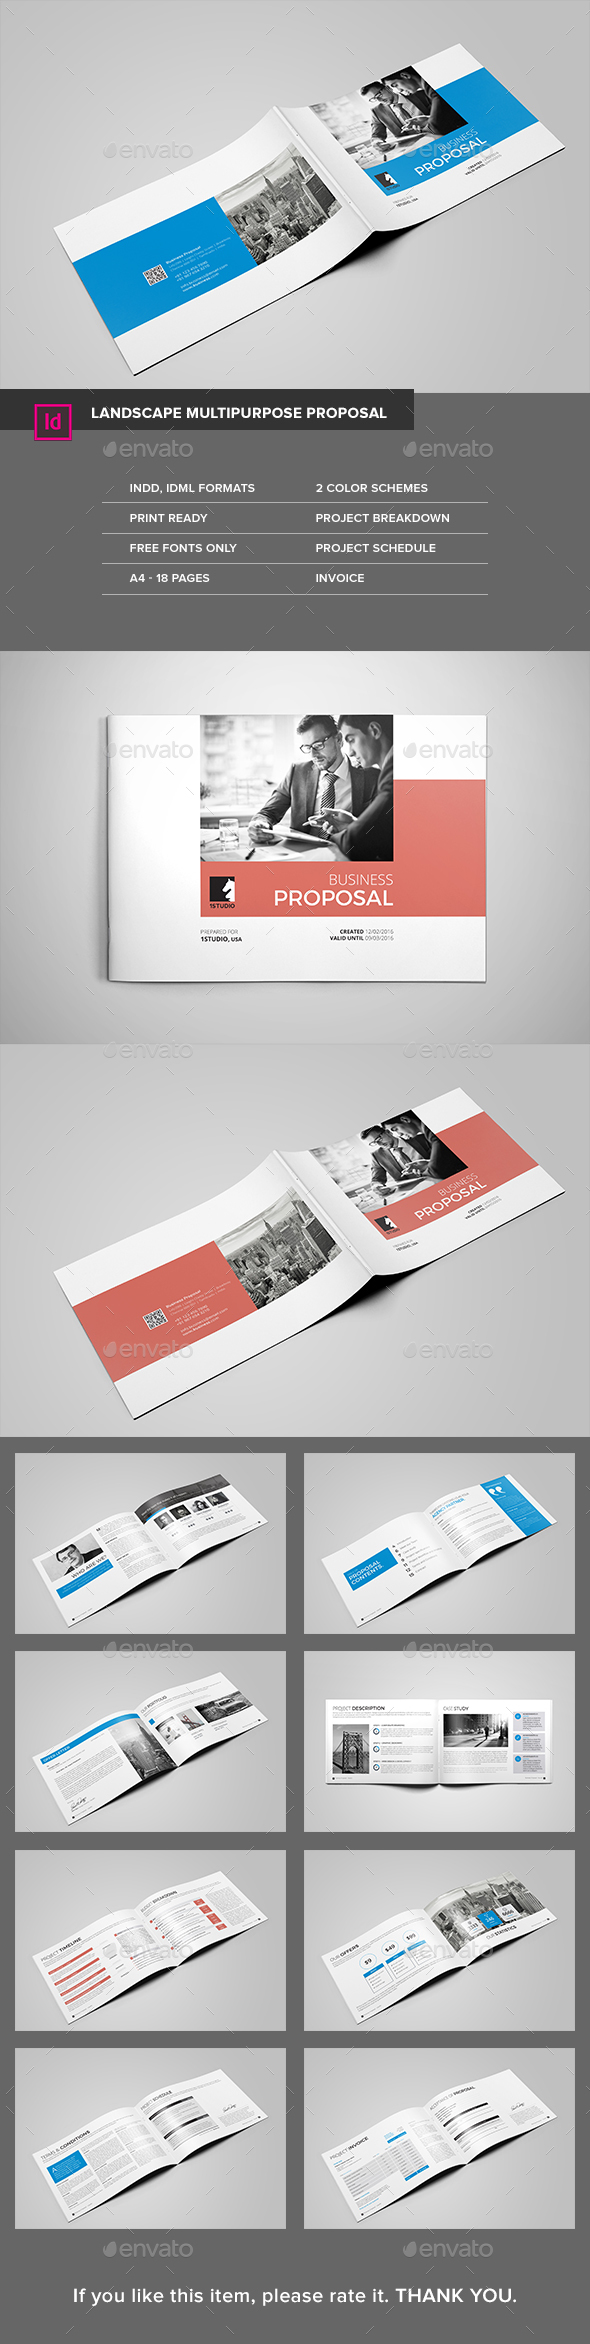 Landscape Multipurpose Proposal - Proposals & Invoices Stationery